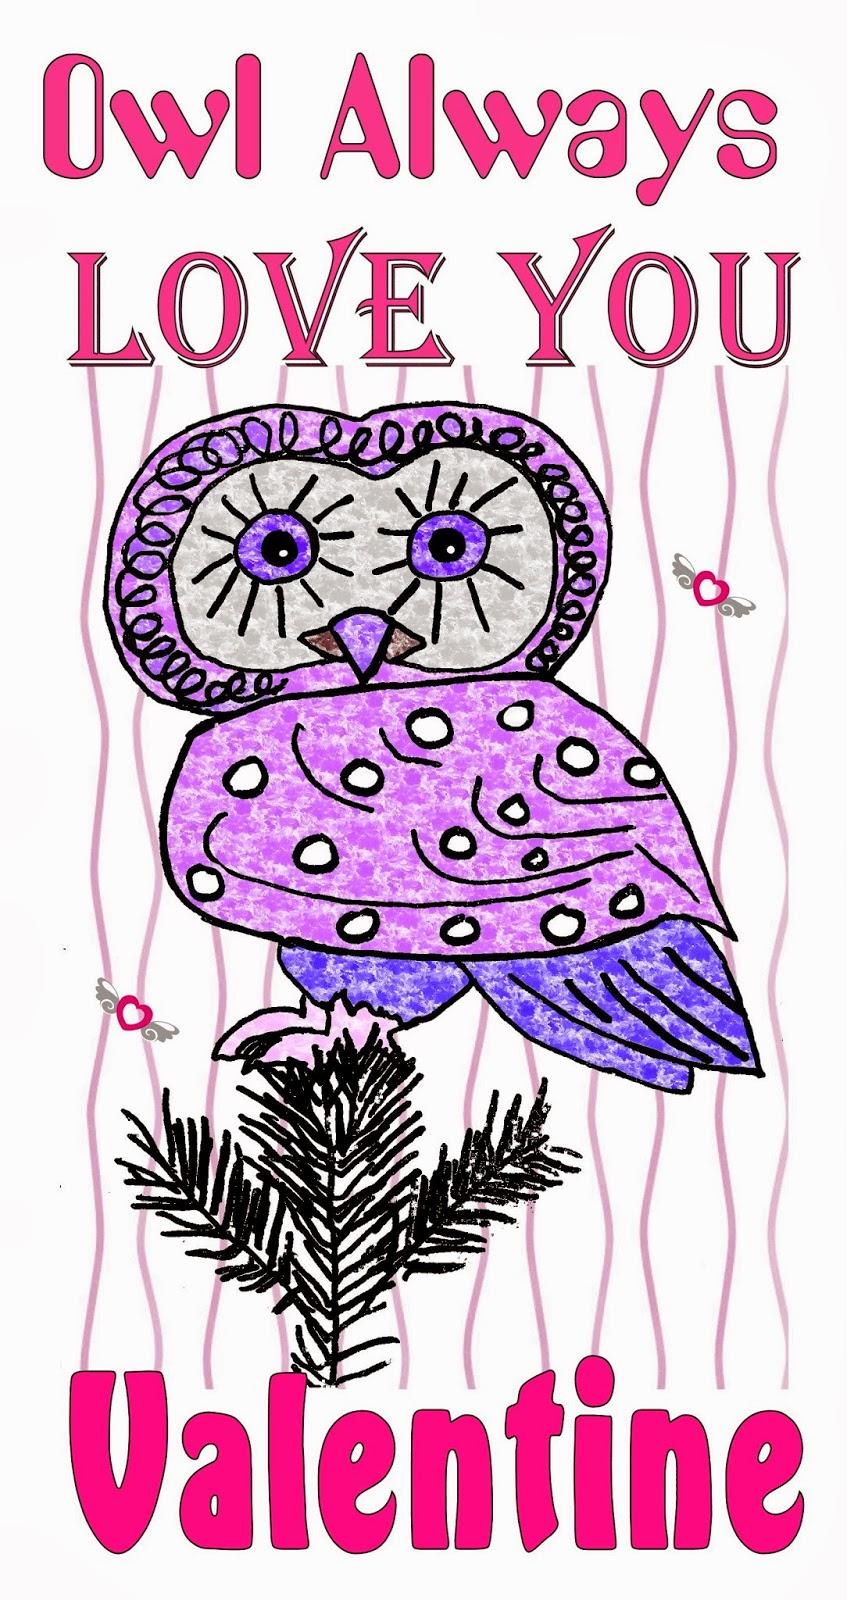 Image Result For Owl Always Love